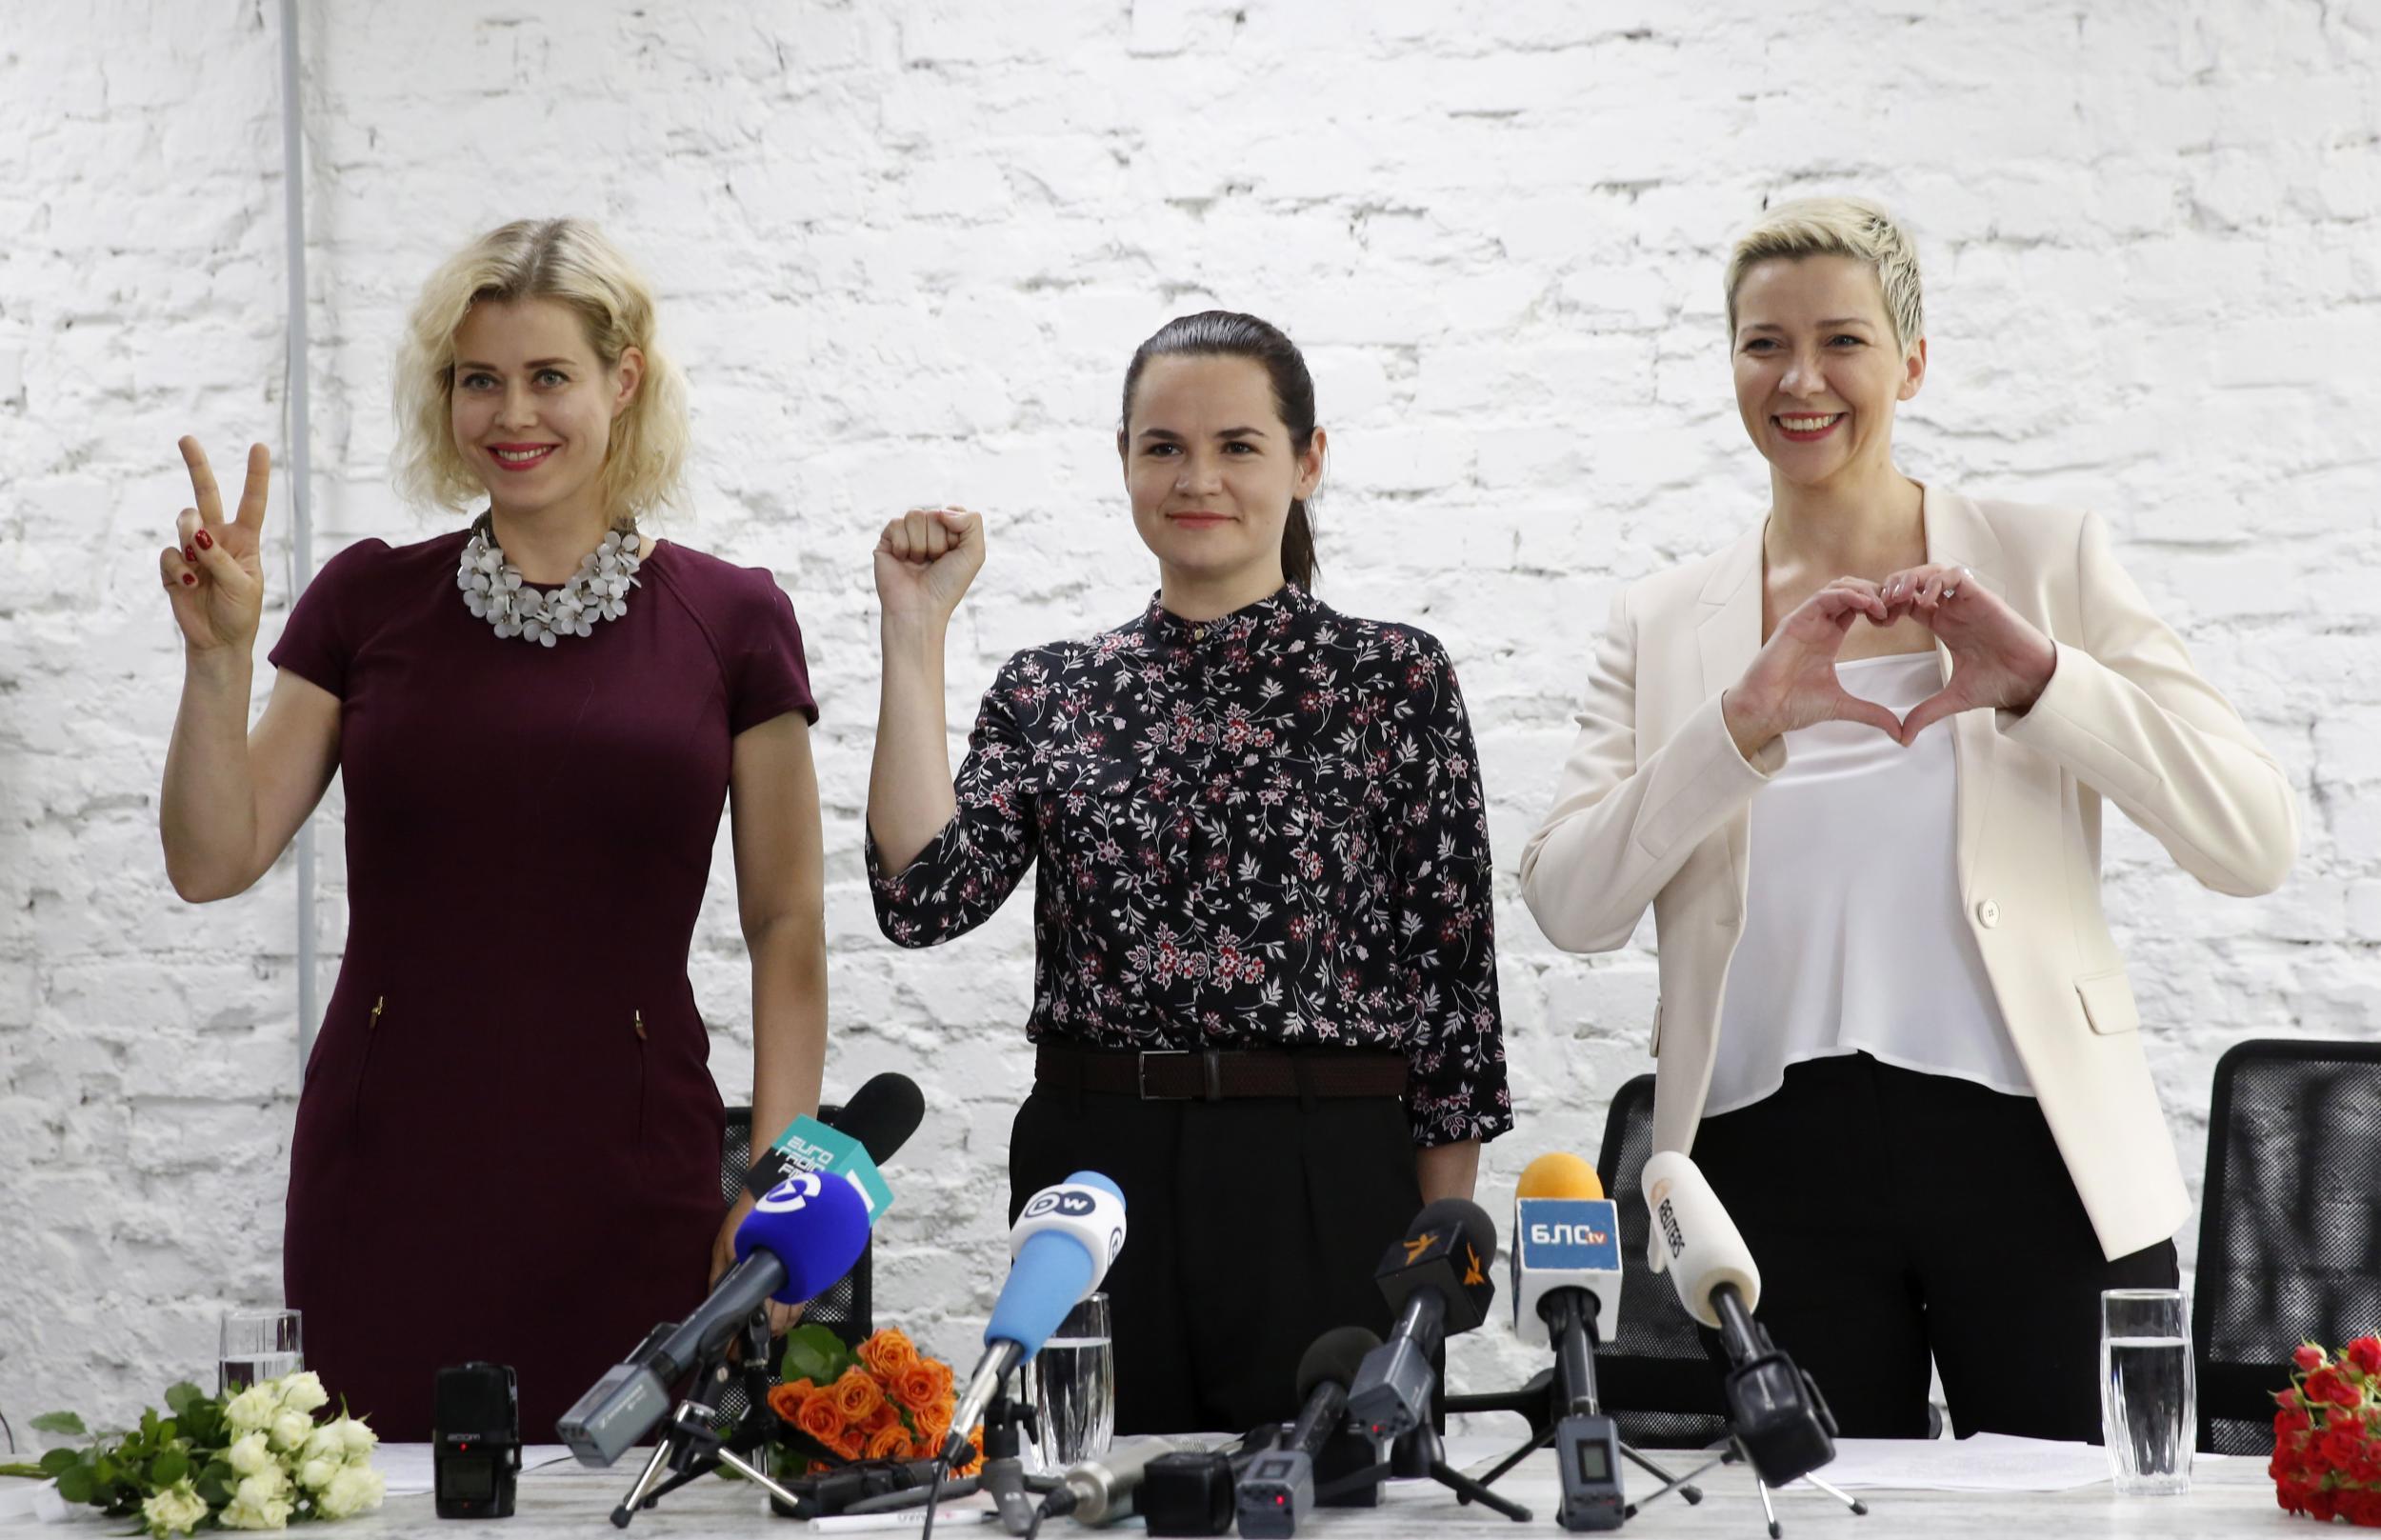 Belarus Opposition Rallies Voters With Promise Of Change  |Svetlana Tikhanovskaya